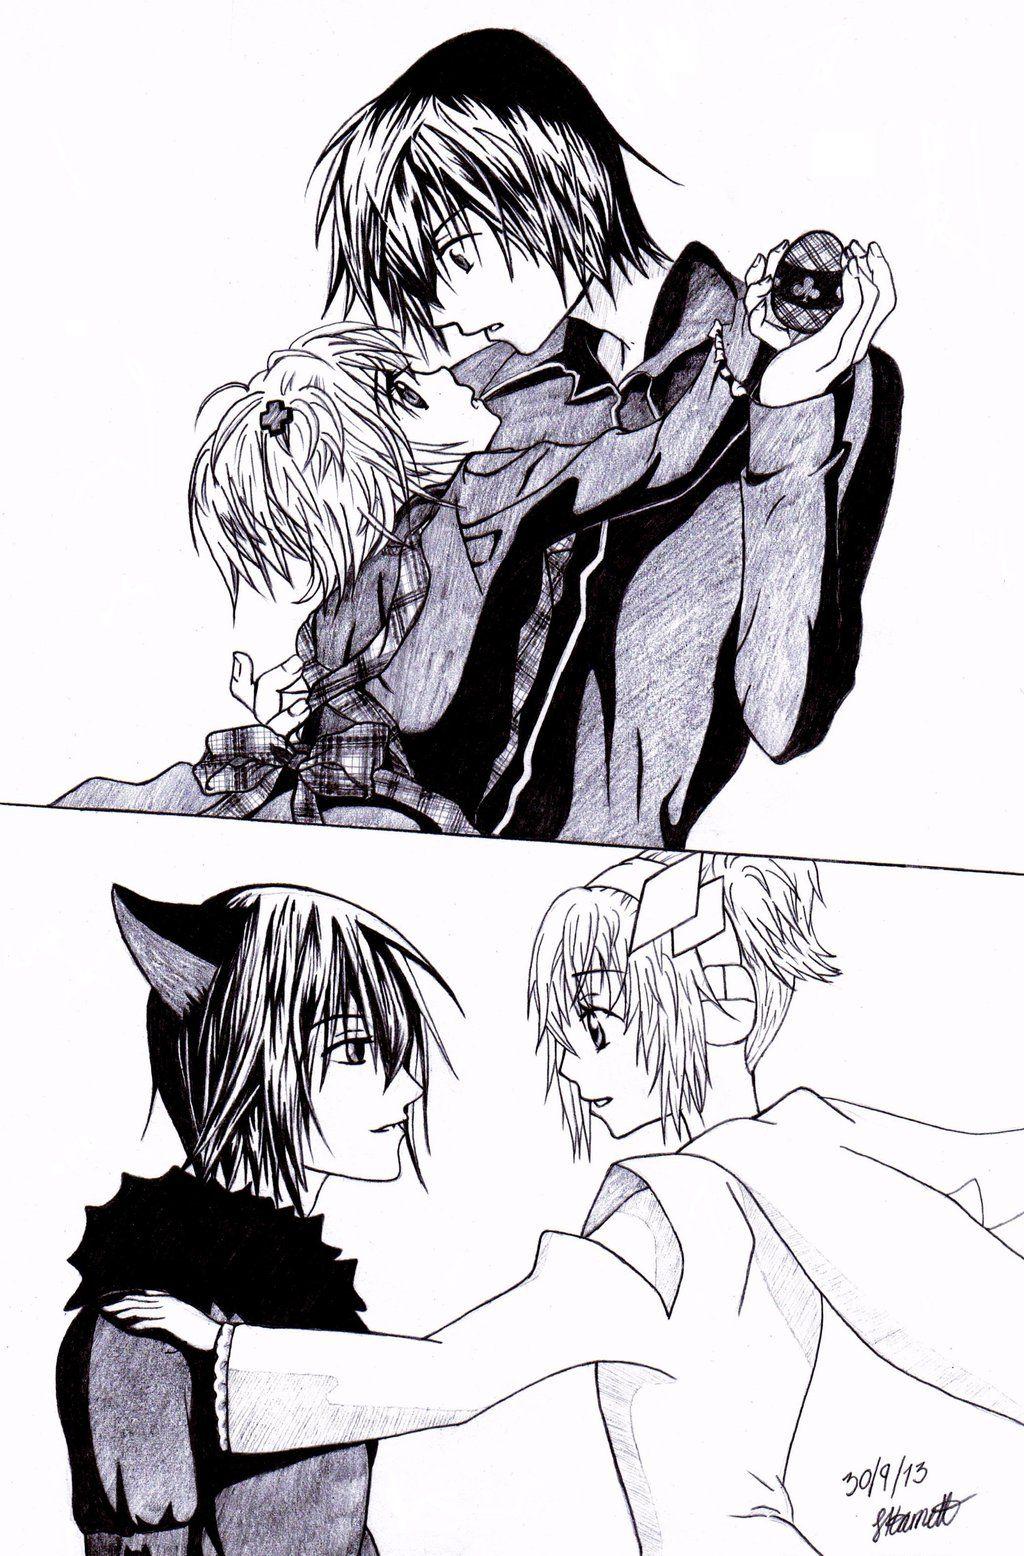 Hinamori Amu and Tsukiyomi Ikuto (Amulet Dia & Death Rebel) from Shugo Chara by ~sophiAmelia on deviantART -